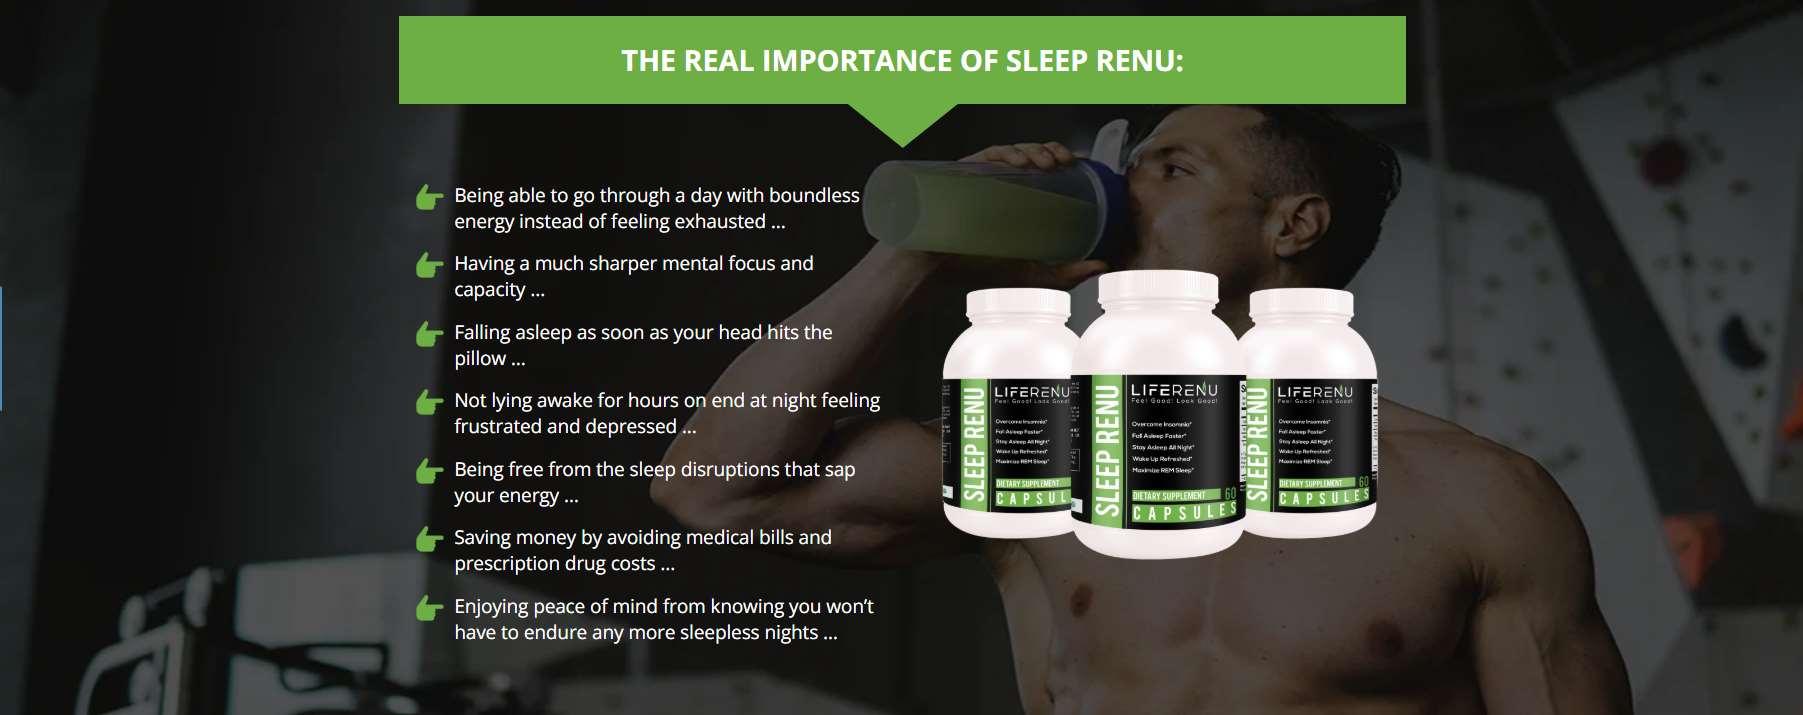 Top Secret Ways To Help You Sleep